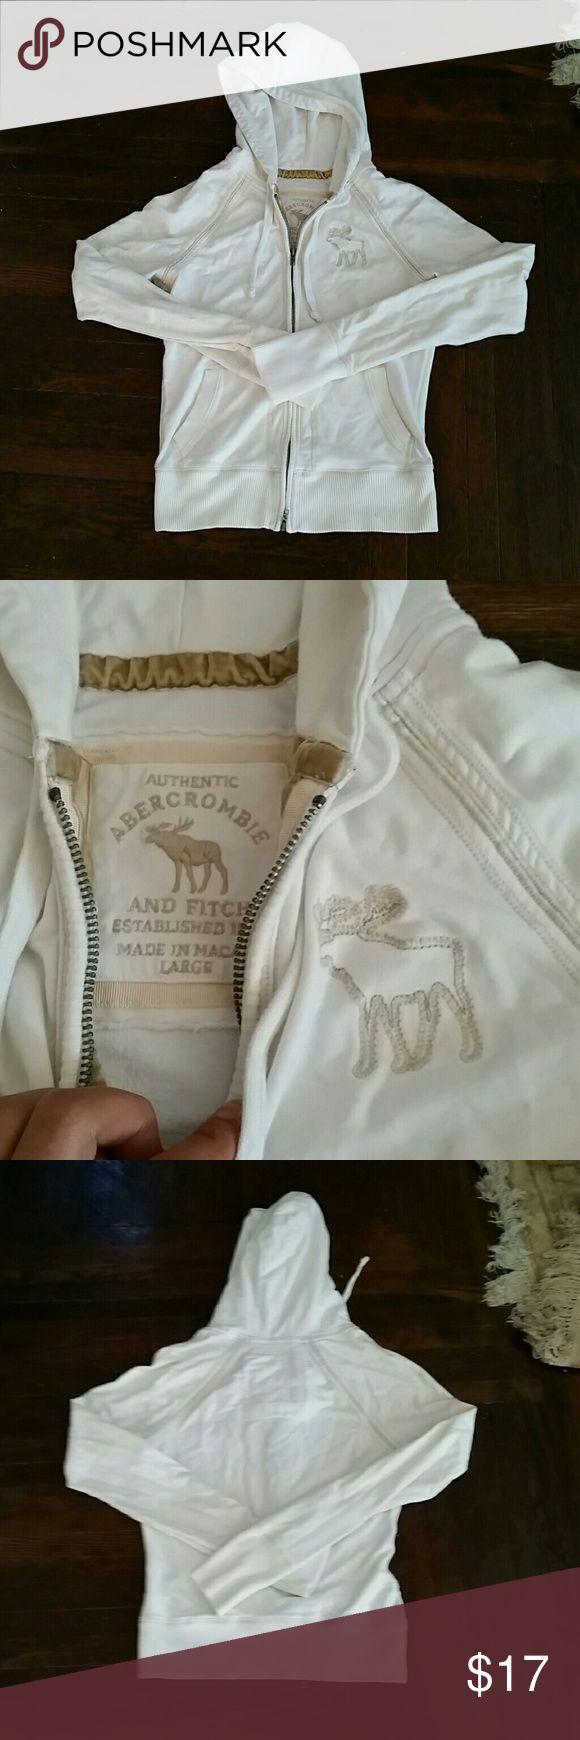 Abercrombie and Fitch zip up hoodie White zip up hoodie. Used. Soft fabric. Size L. Abercrombie & Fitch Tops Sweatshirts & Hoodies